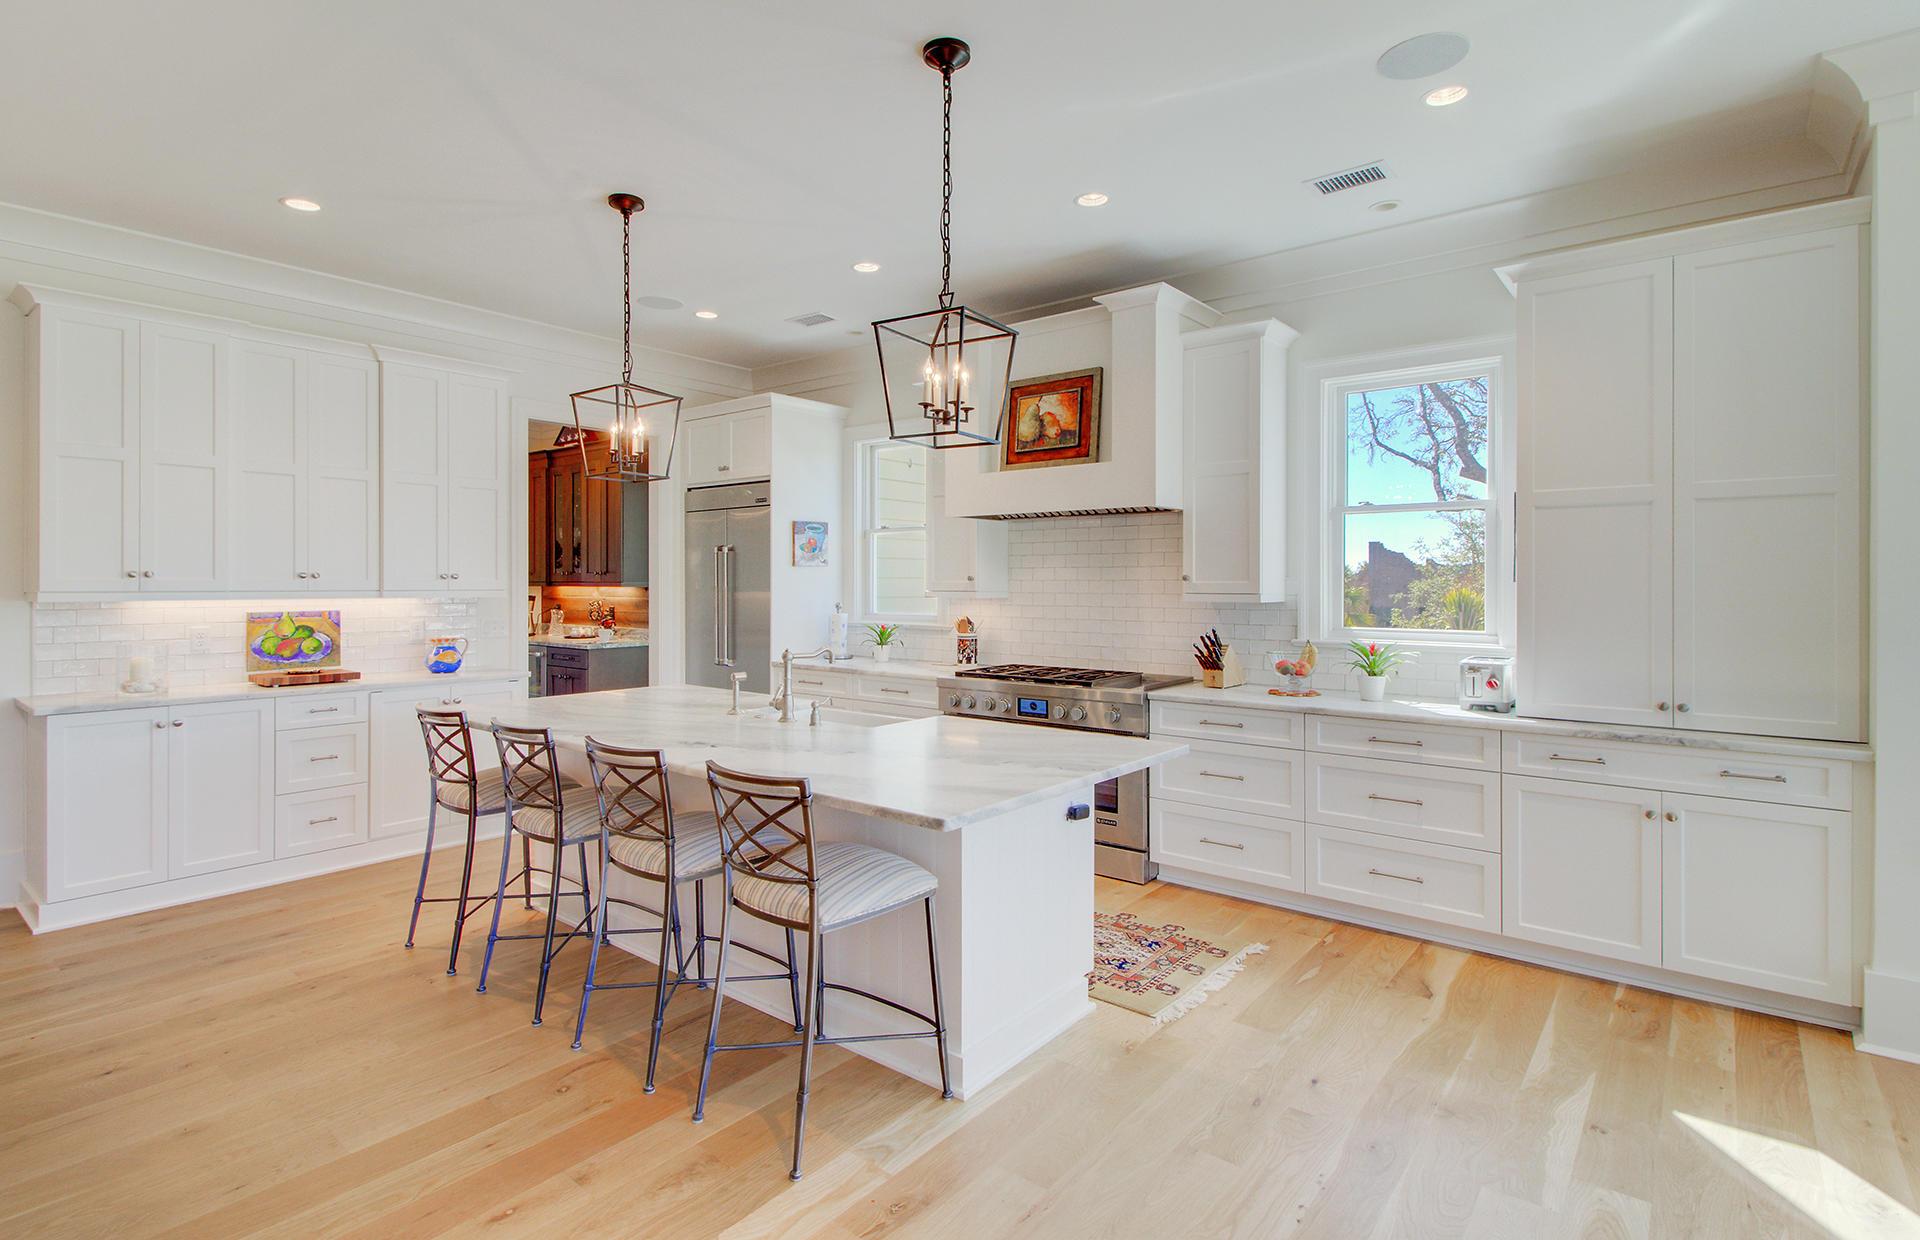 Beresford Hall Homes For Sale - 253 Grand Park, Charleston, SC - 10